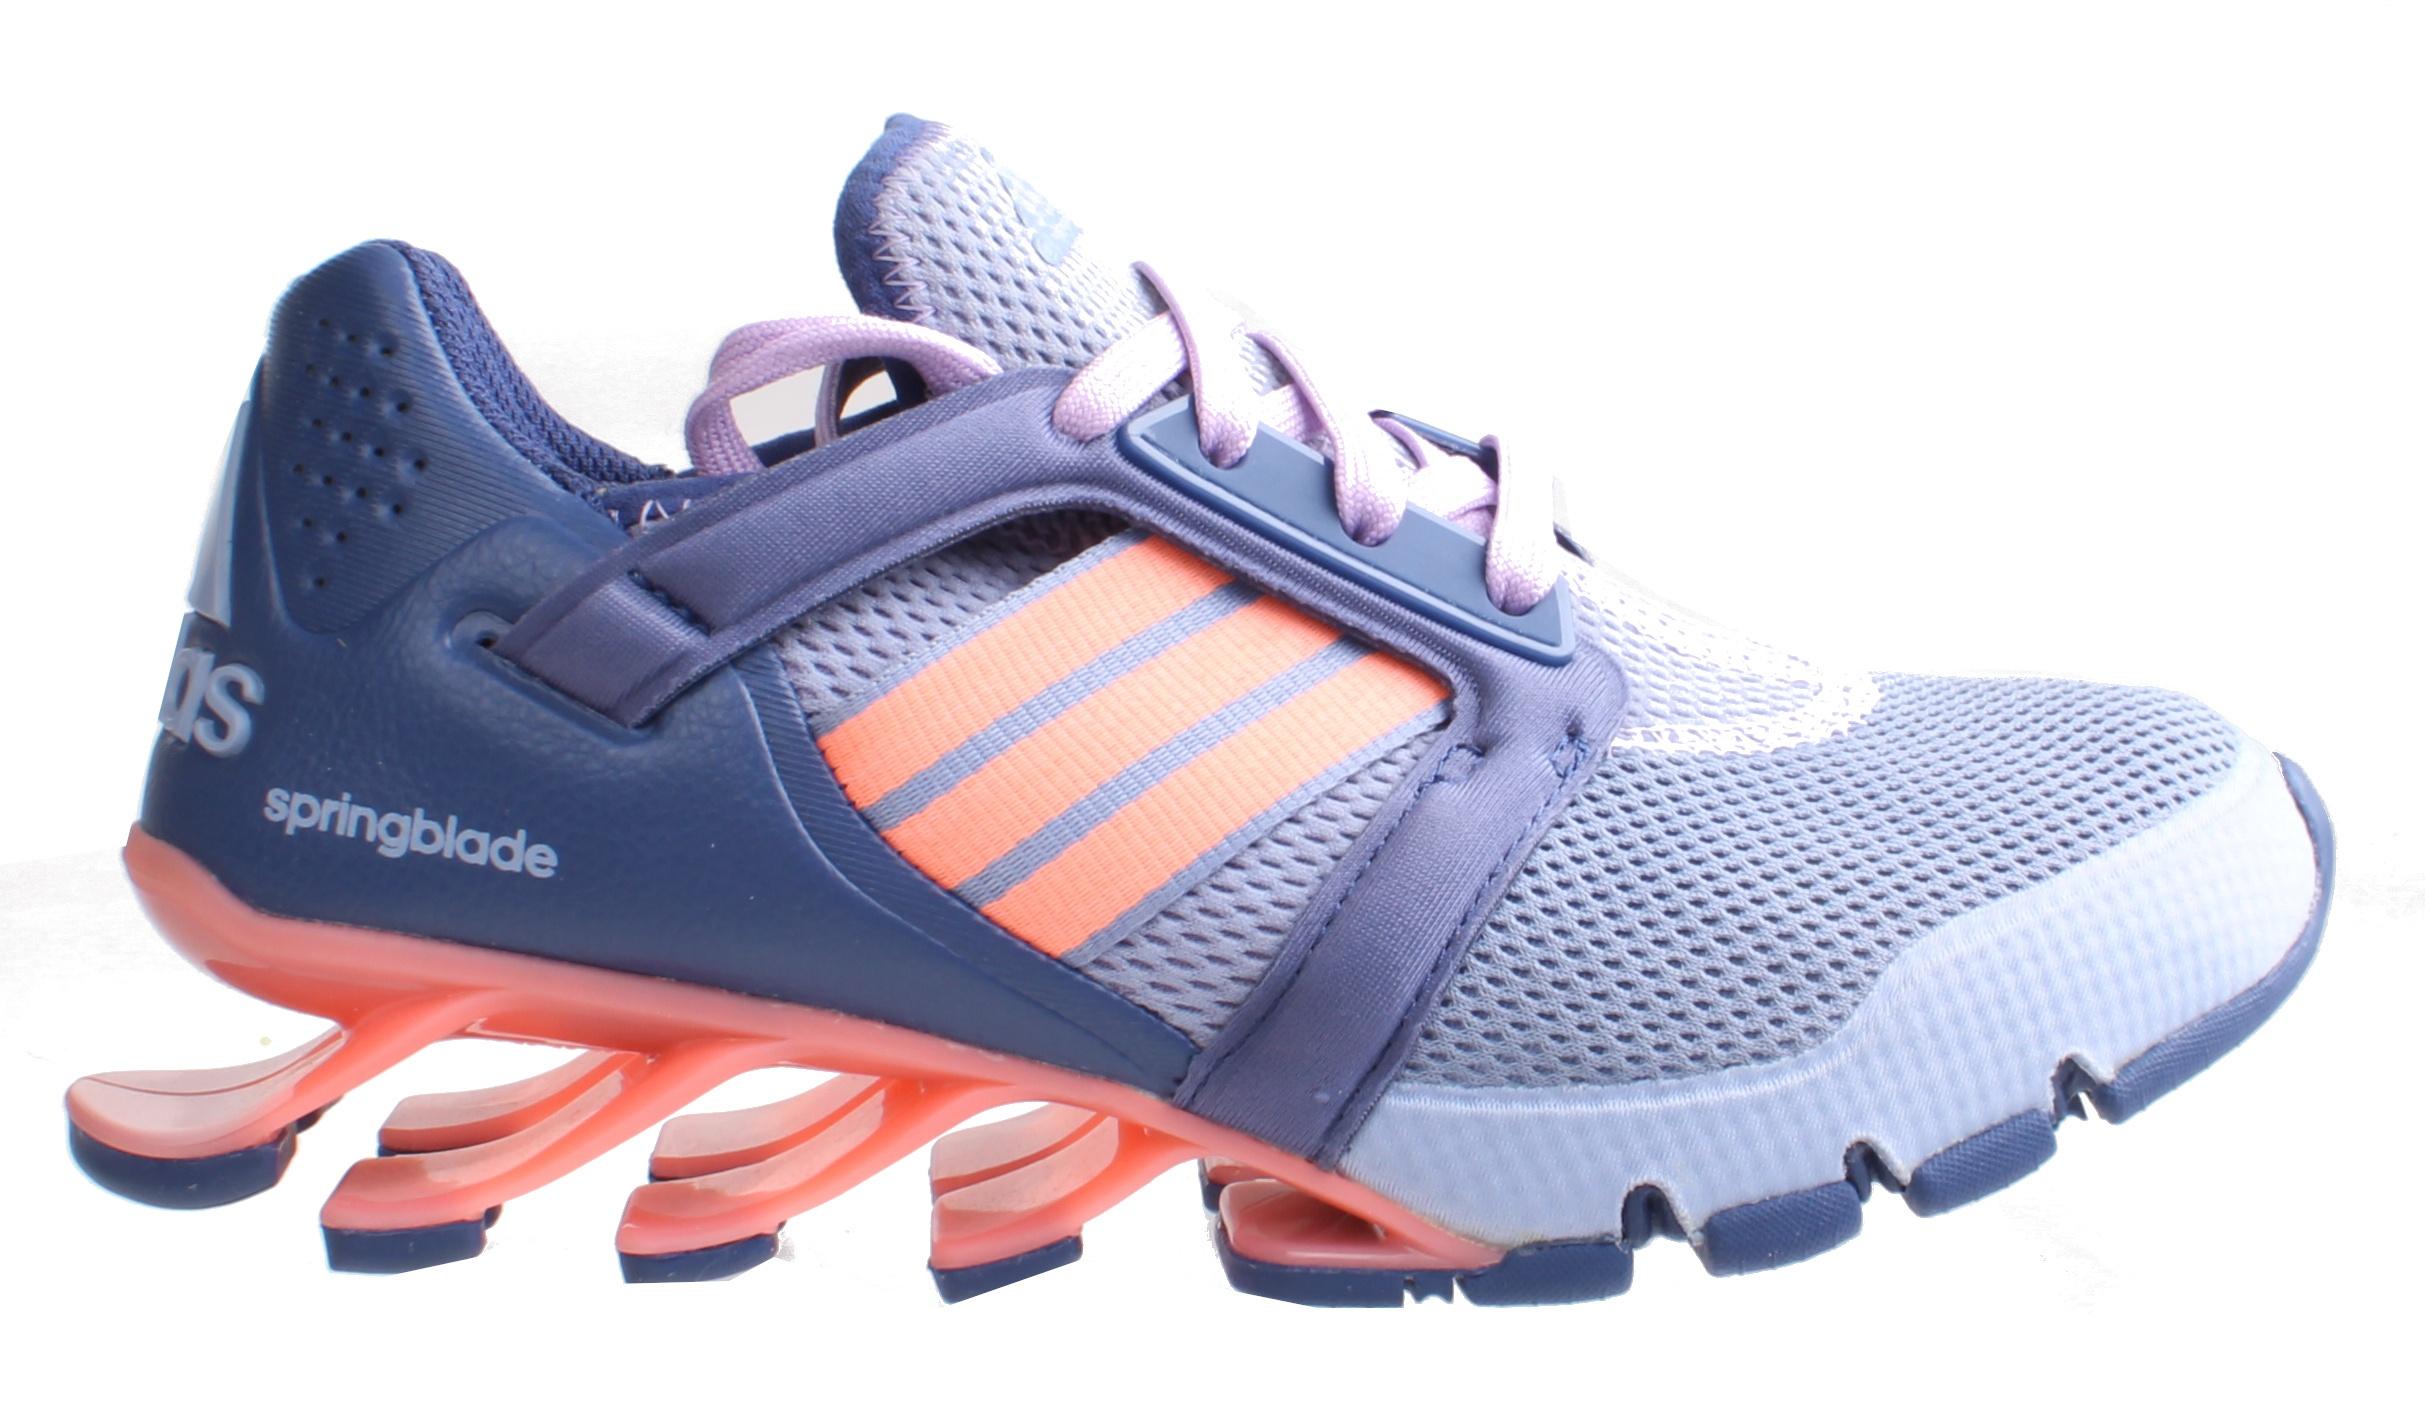 adidas hardloopschoenen dames Springblade E Force